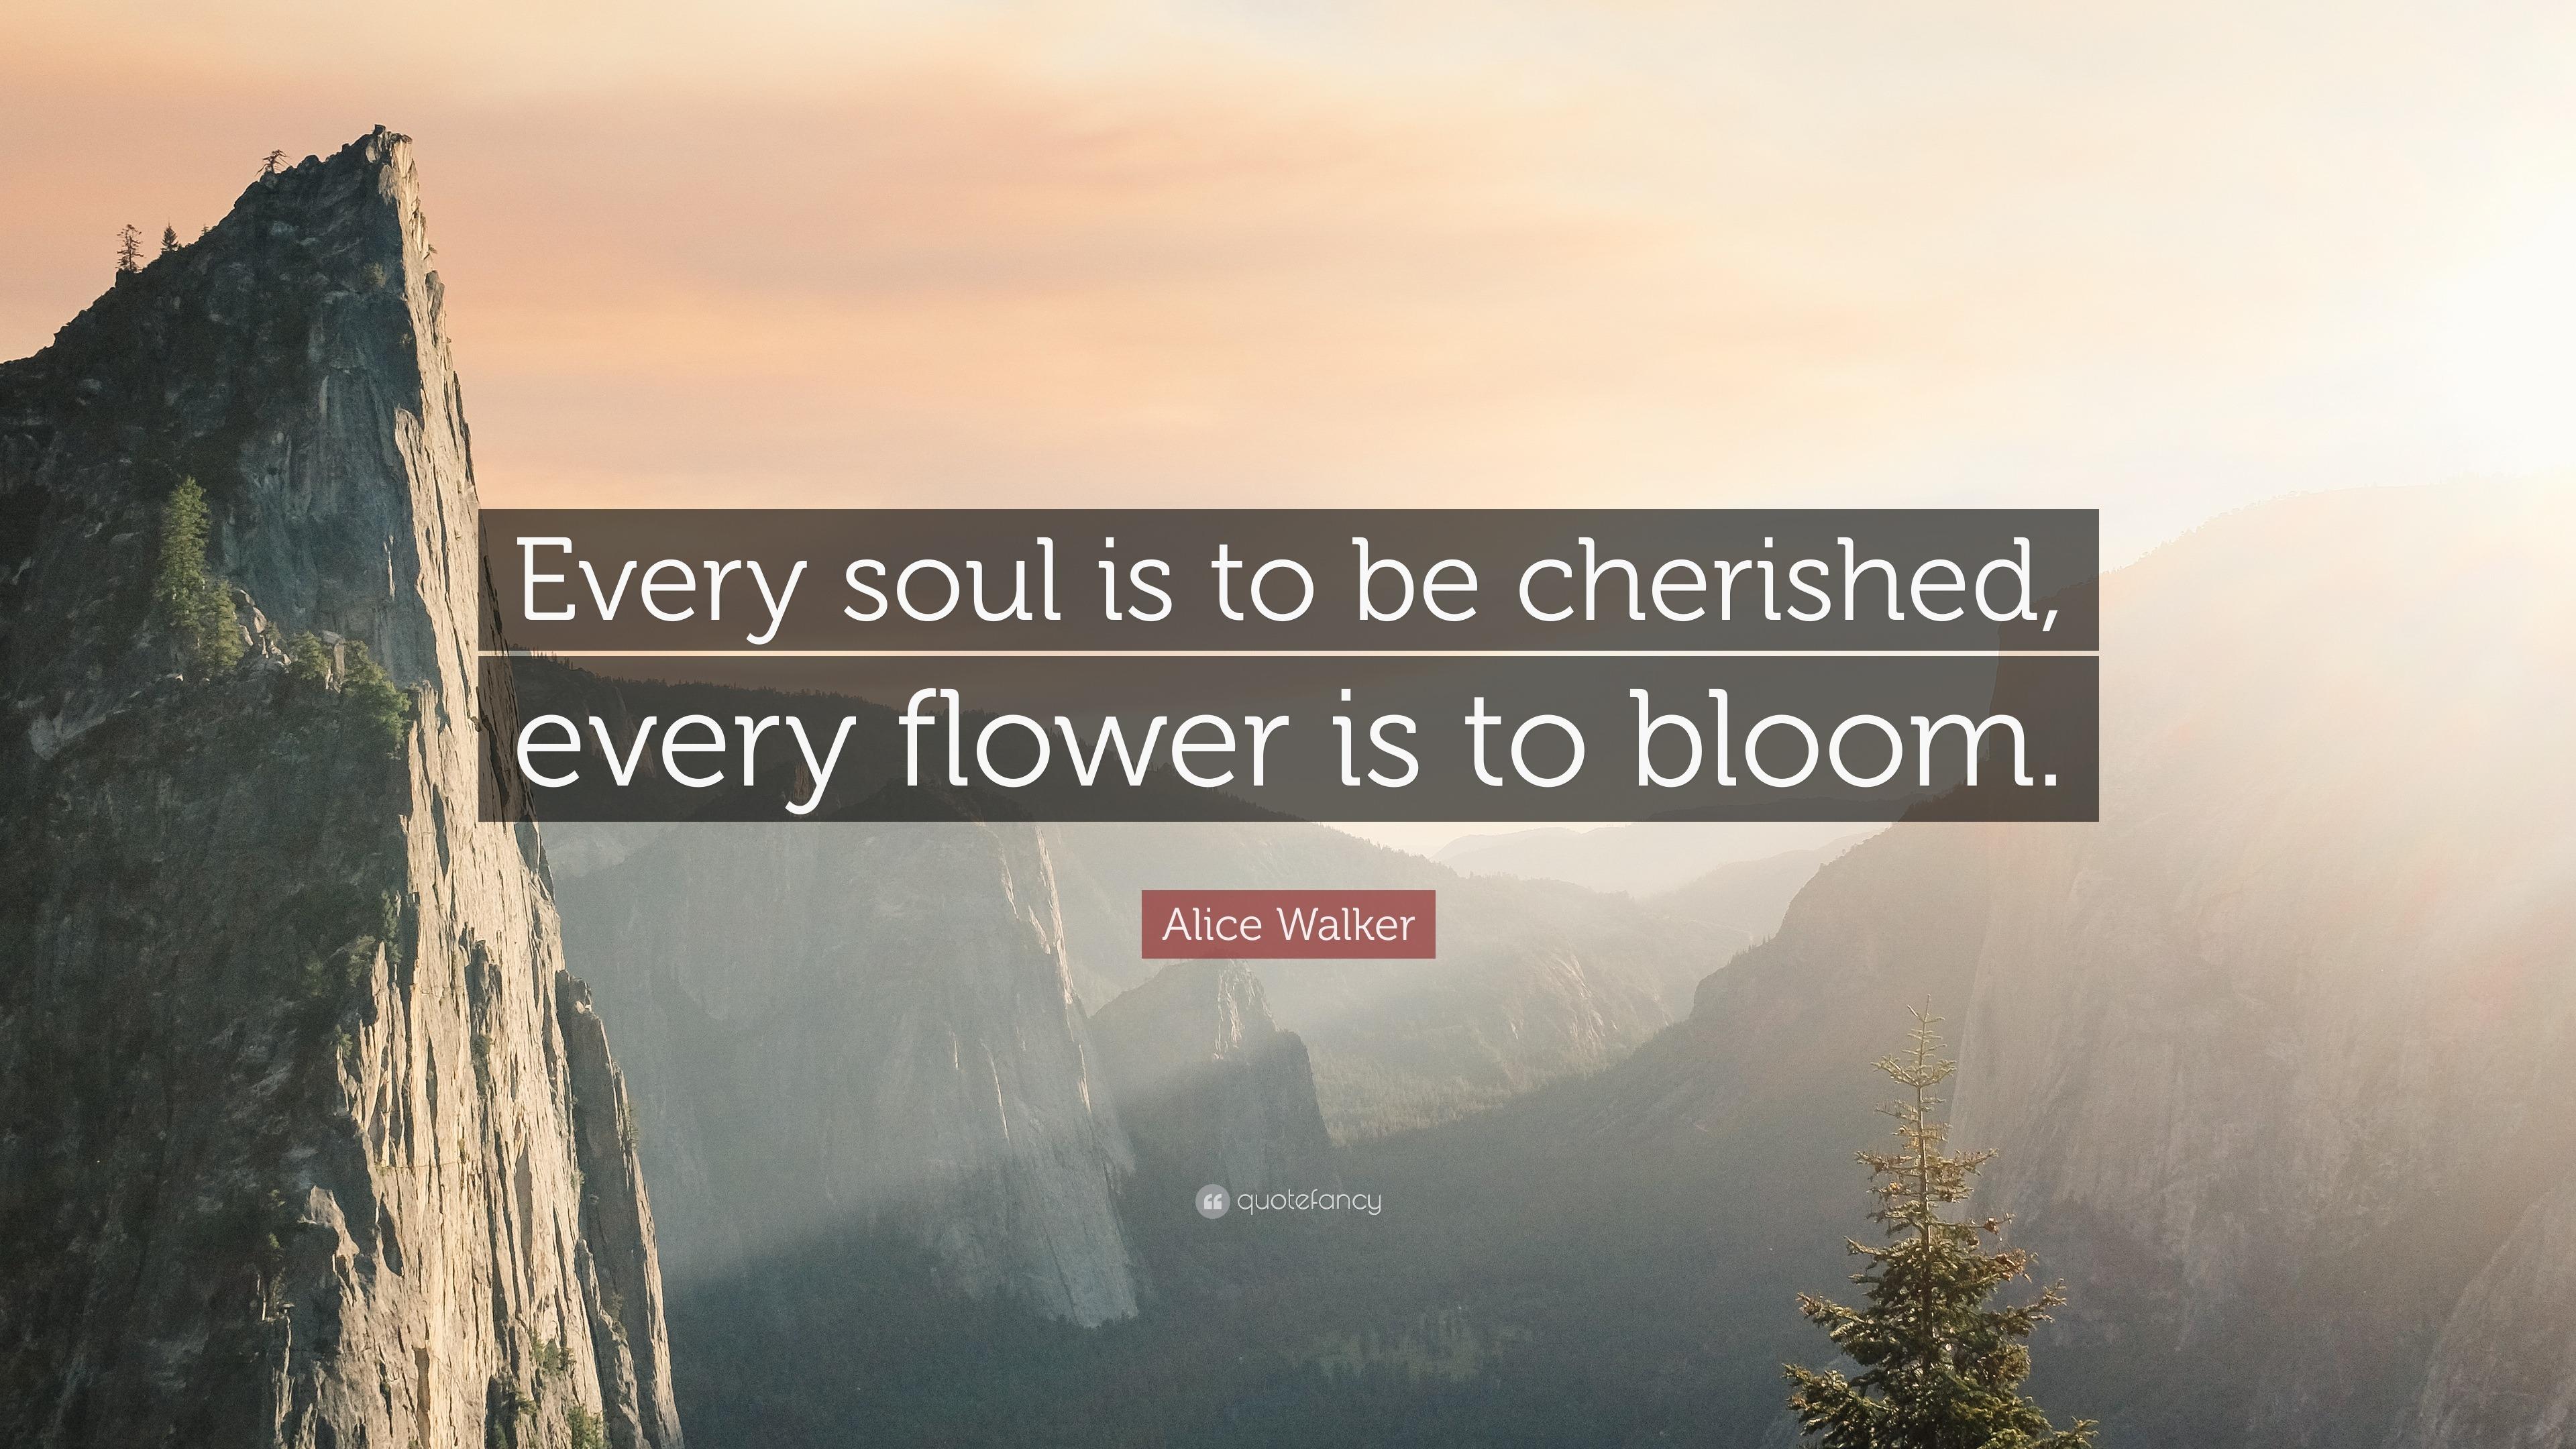 alice walker the flowers full text